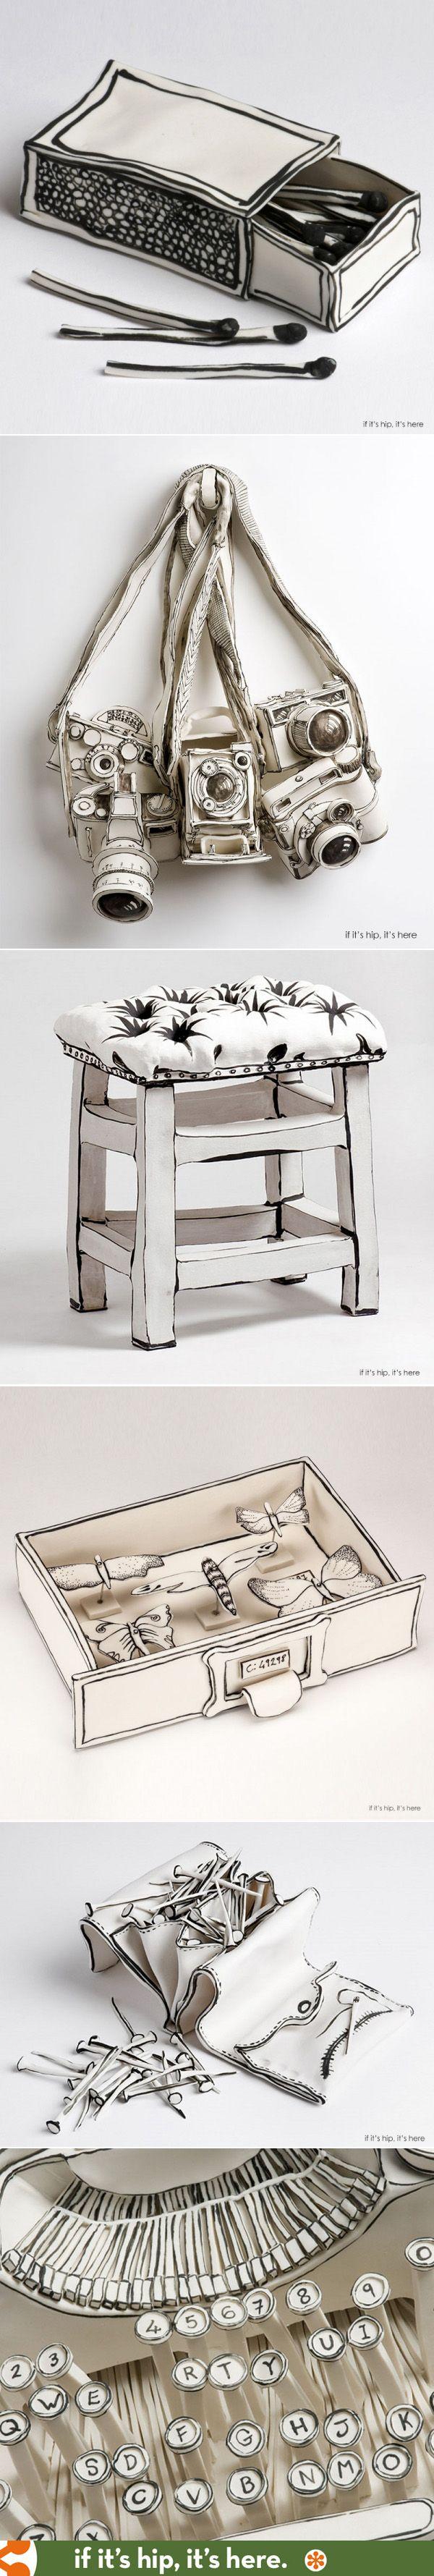 The illustrative sculptural ceramics of Katharine Morling.